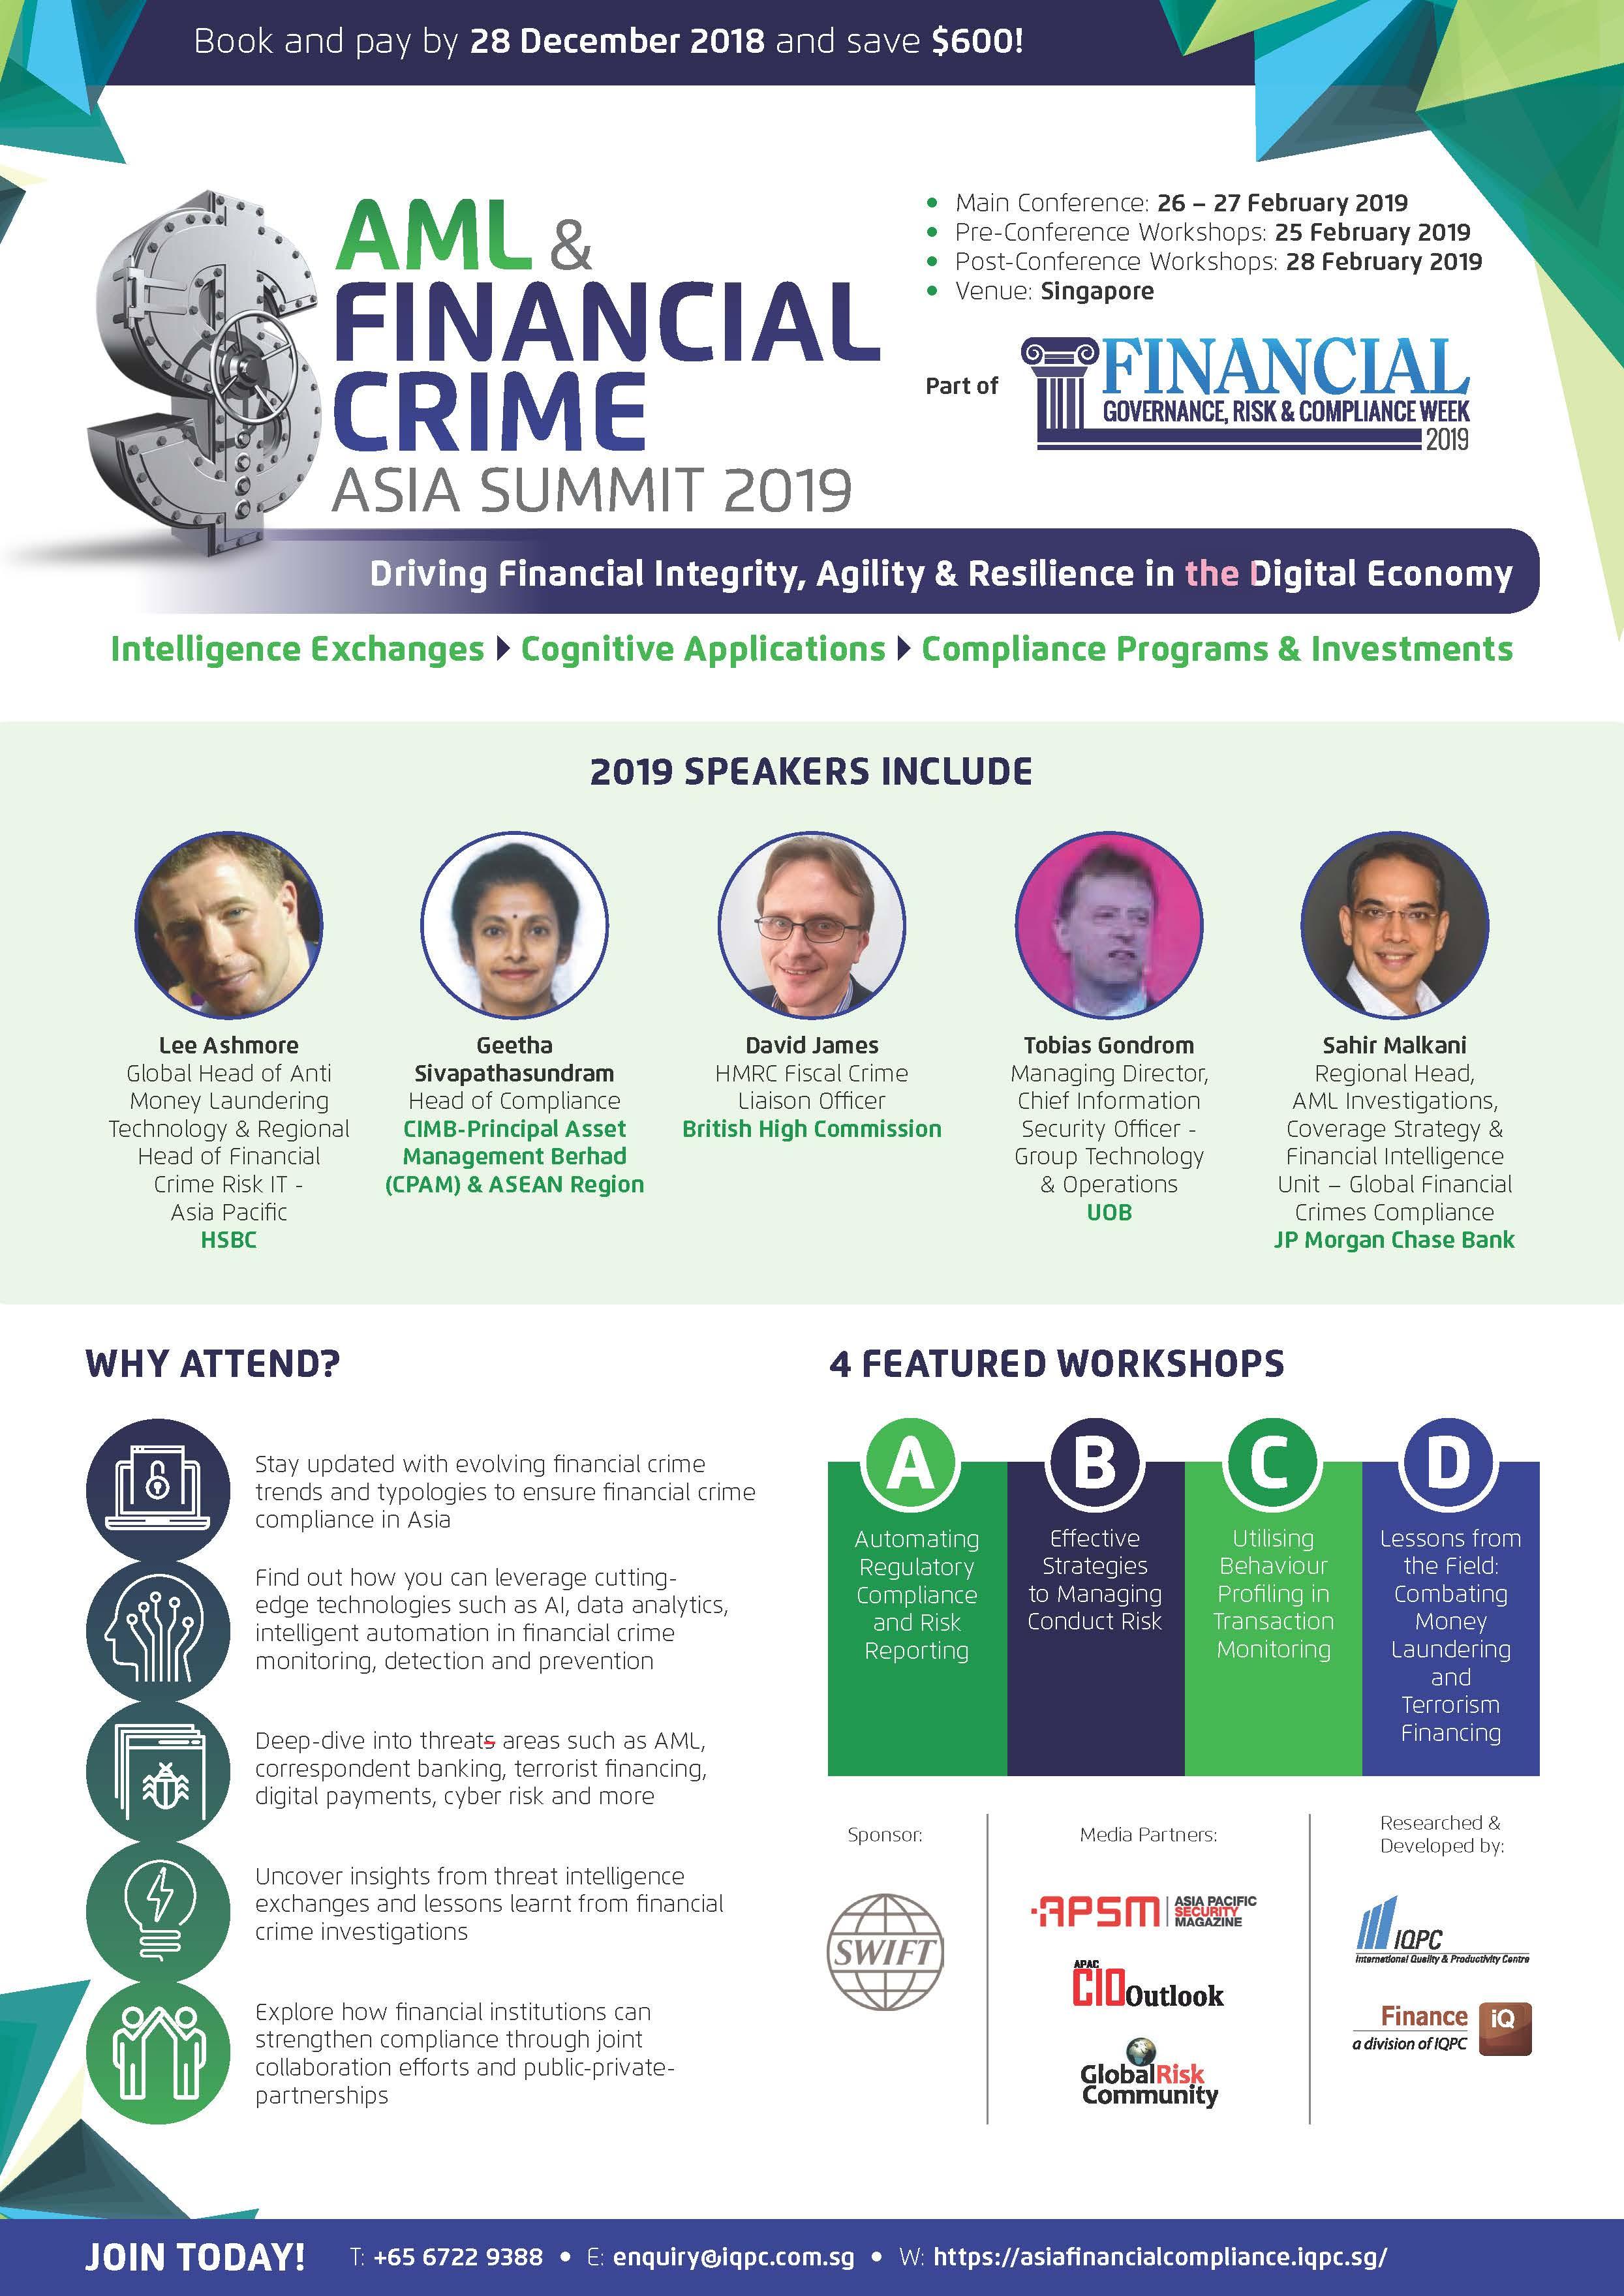 Financial Governance, Risk & Compliance Week Asia 2019 Brochure SPEX